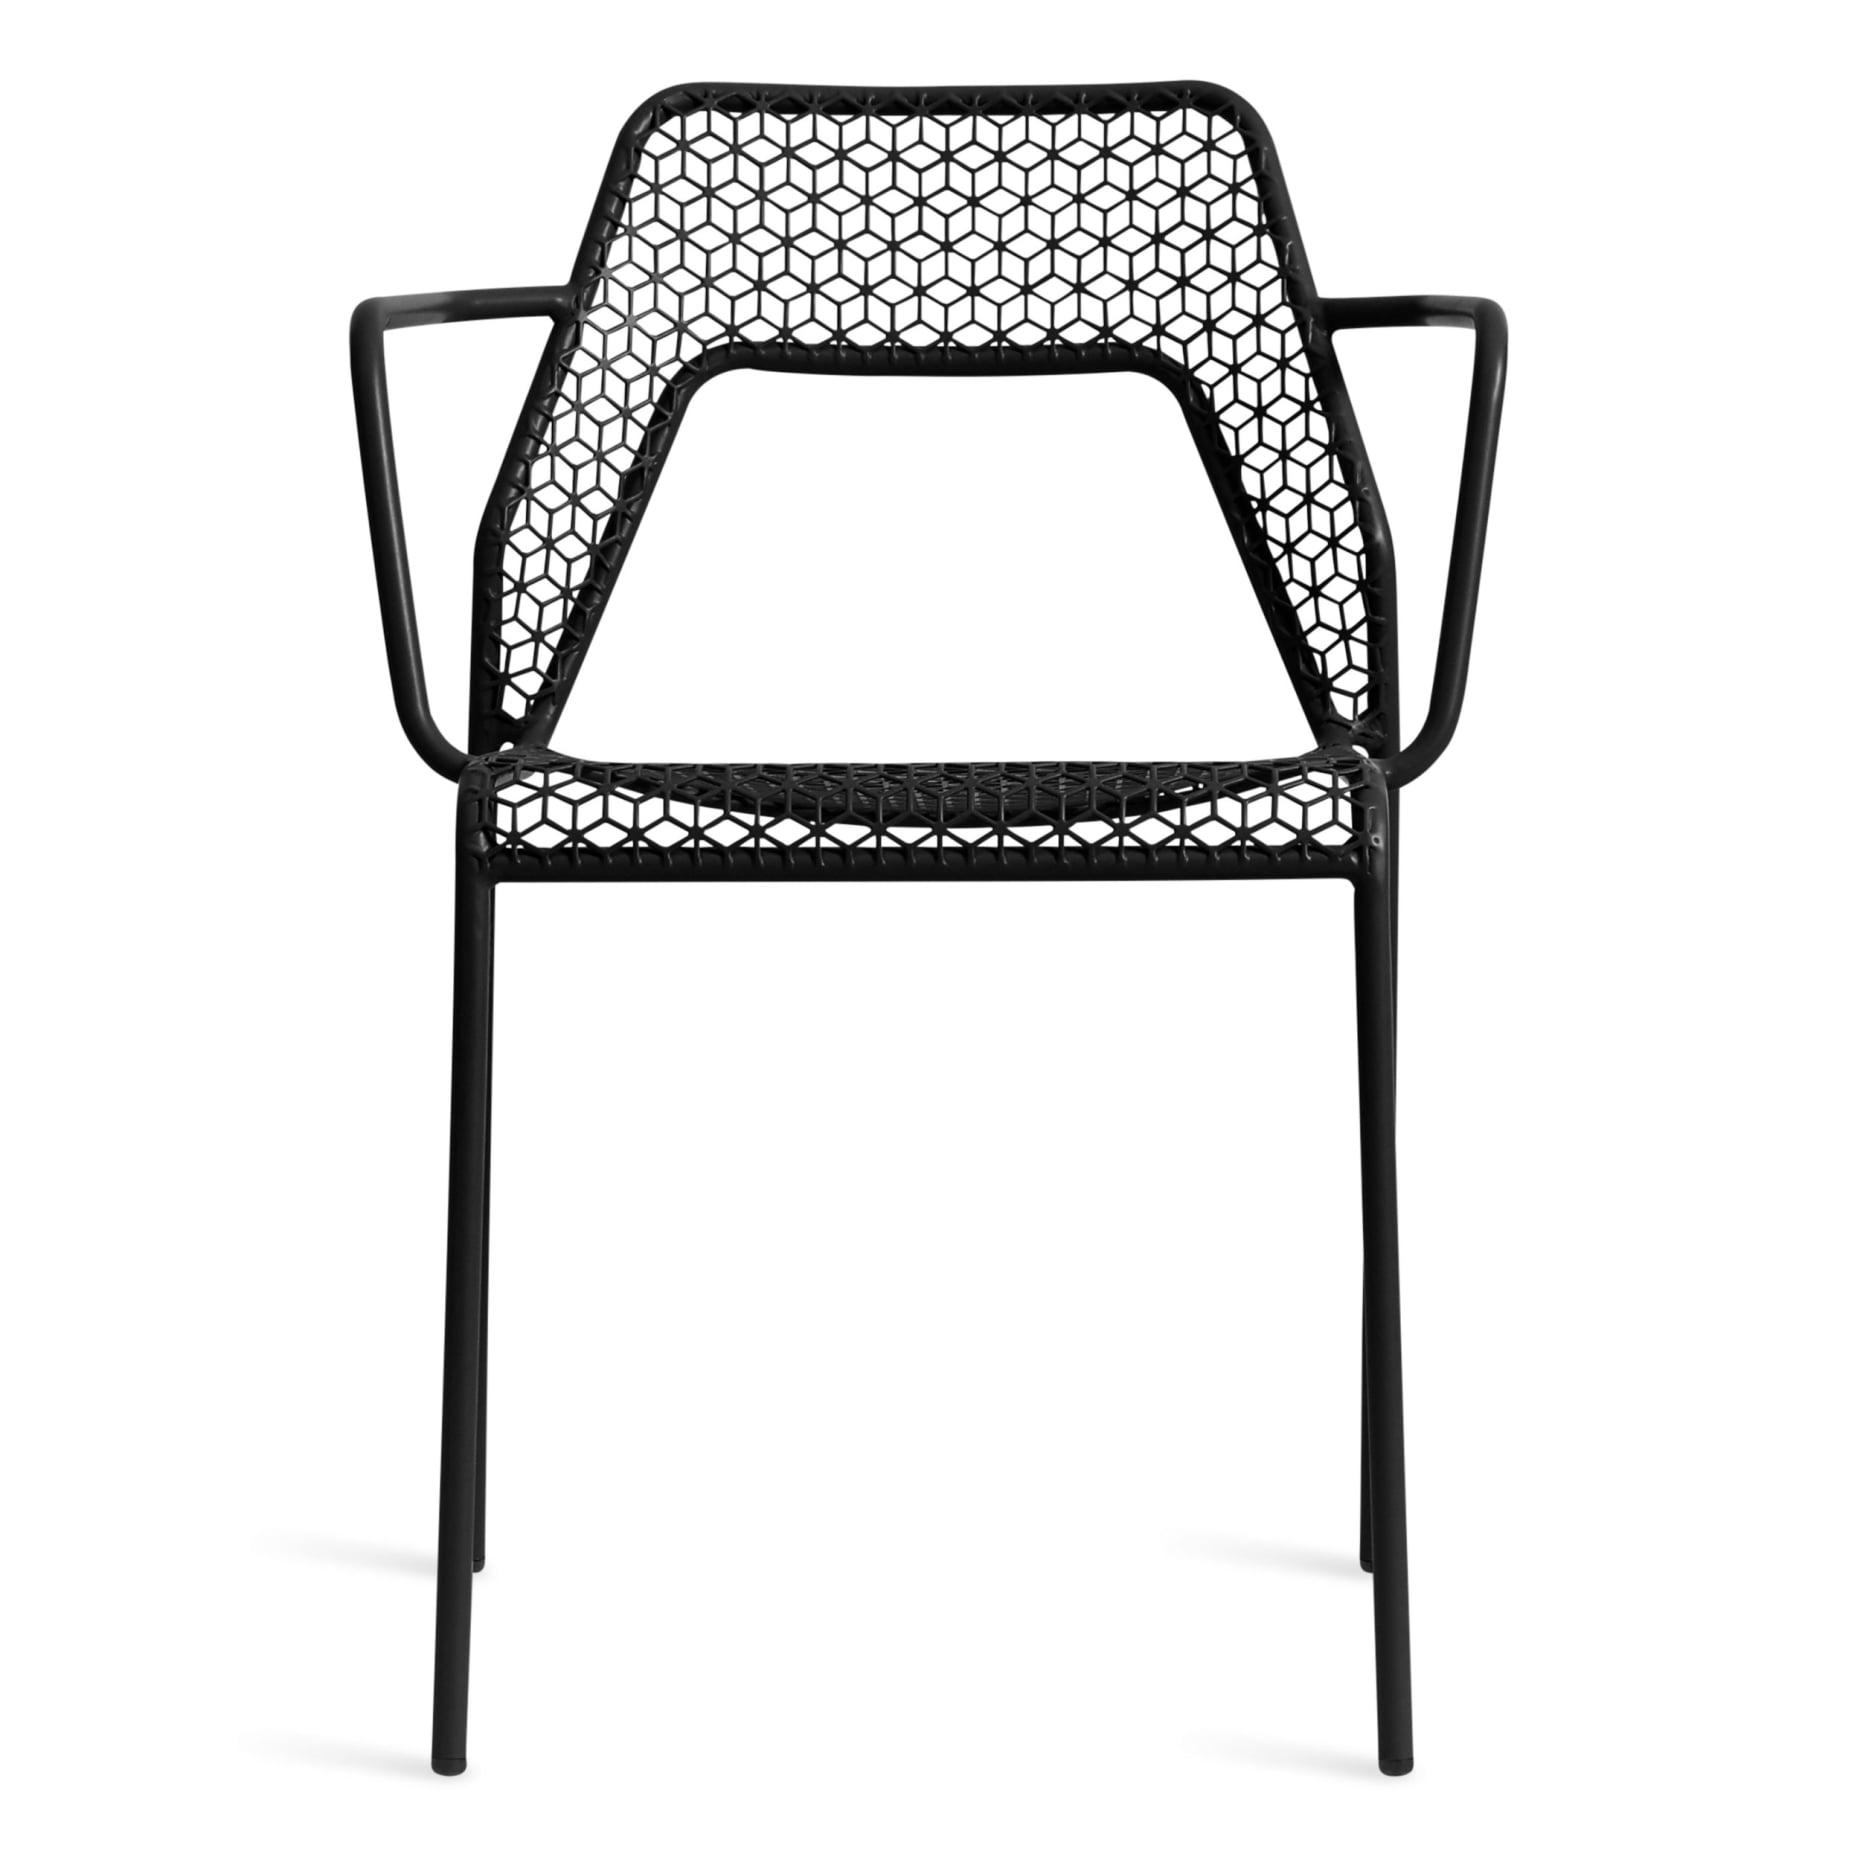 hm1 armchr bk hot mesh armchair black